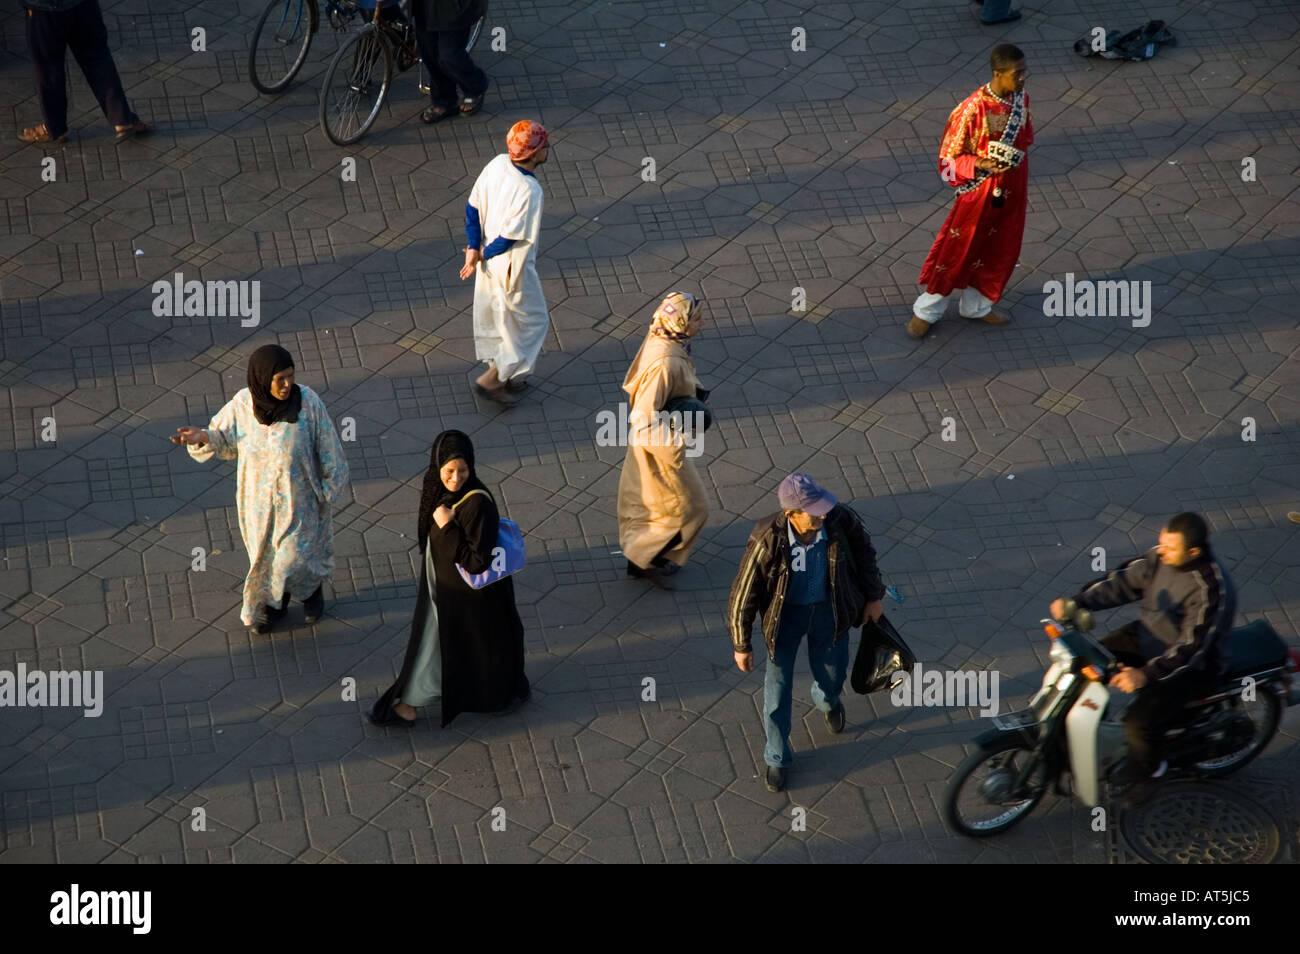 Morocco Jemaa el Fna Square Marrakech evening - Stock Image